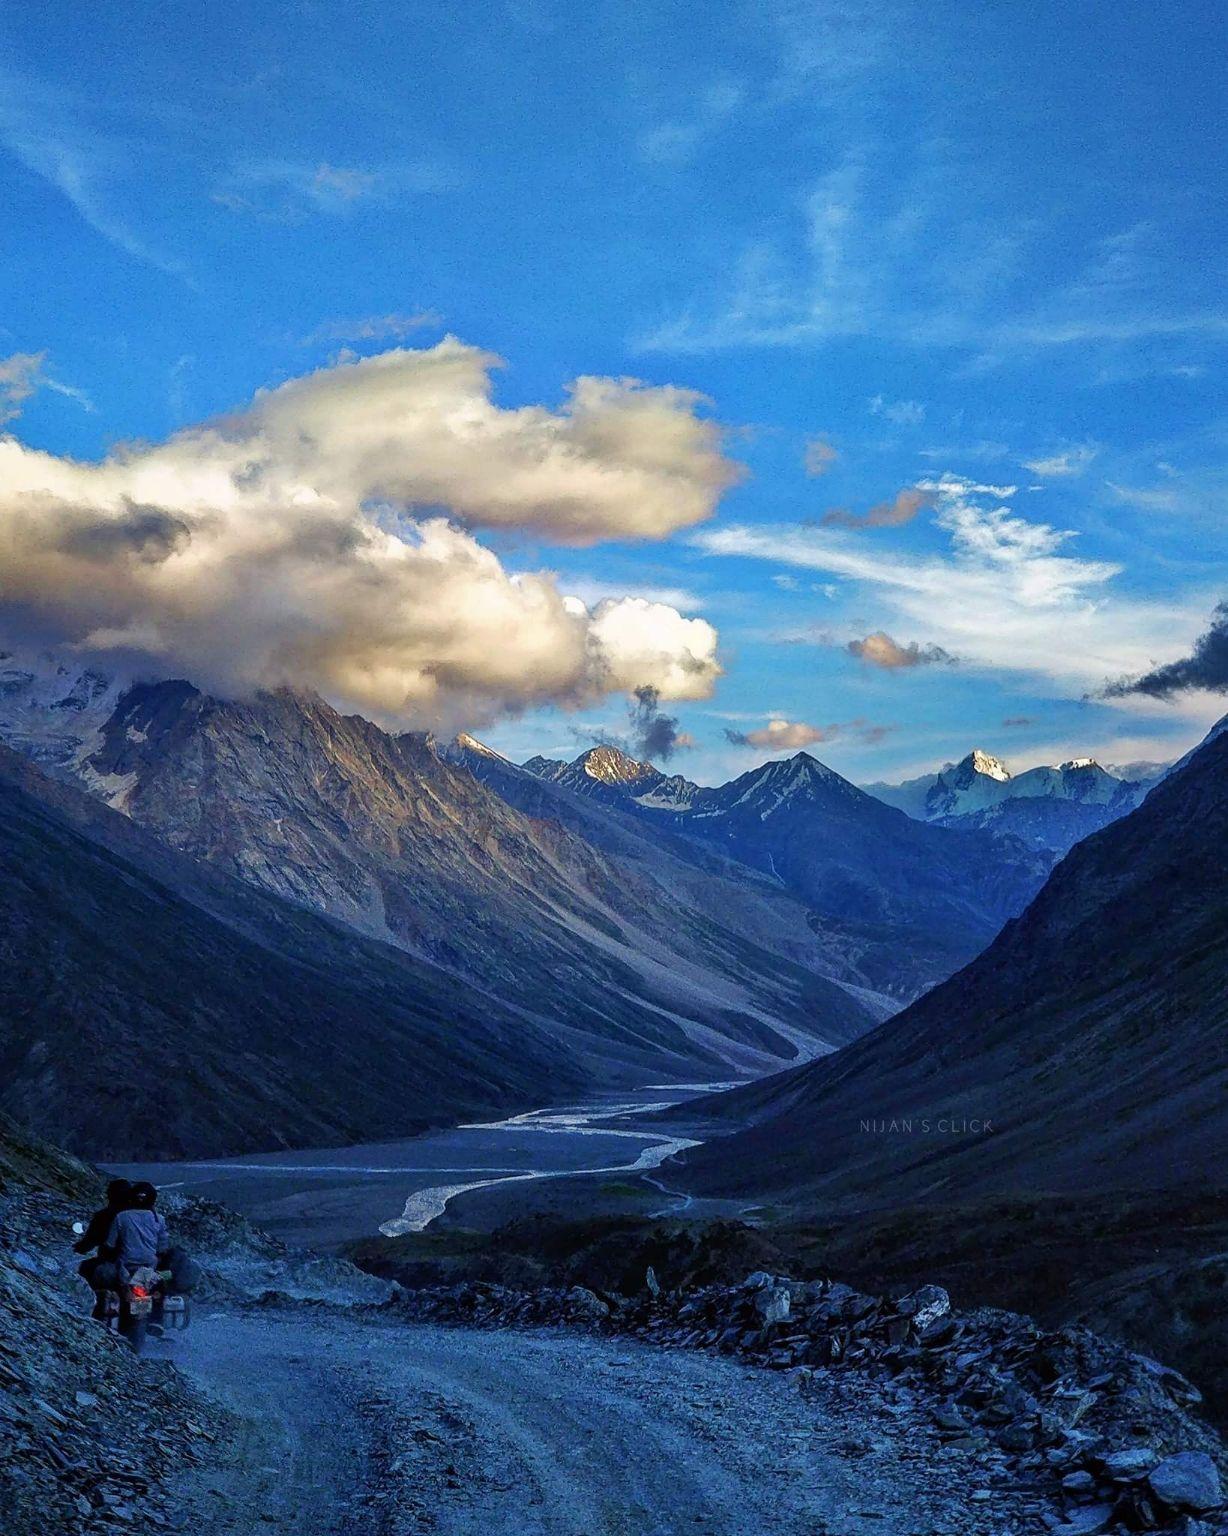 Photo of Spiti Valley By Nijan